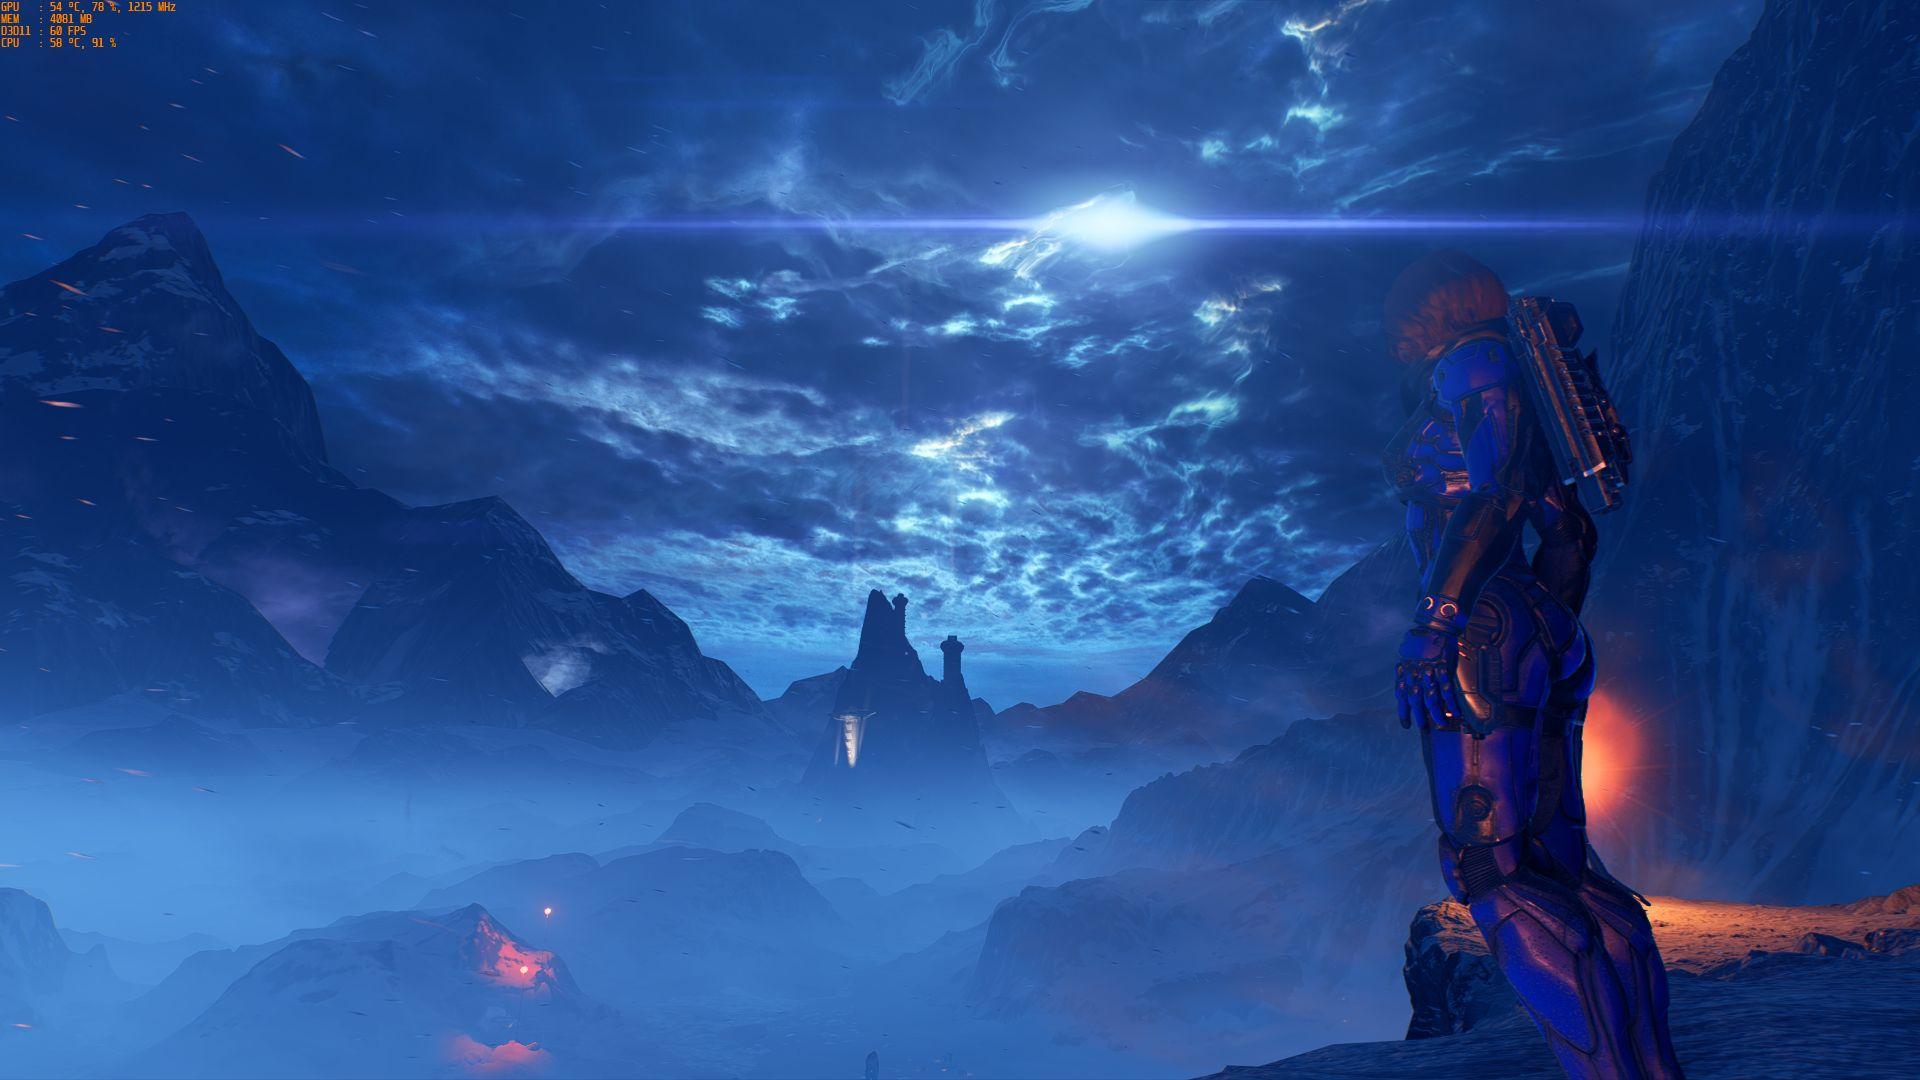 Mass Effect Andromeda Screenshot 2017.07.23 - 19.15.35.62.jpg - Mass Effect: Andromeda